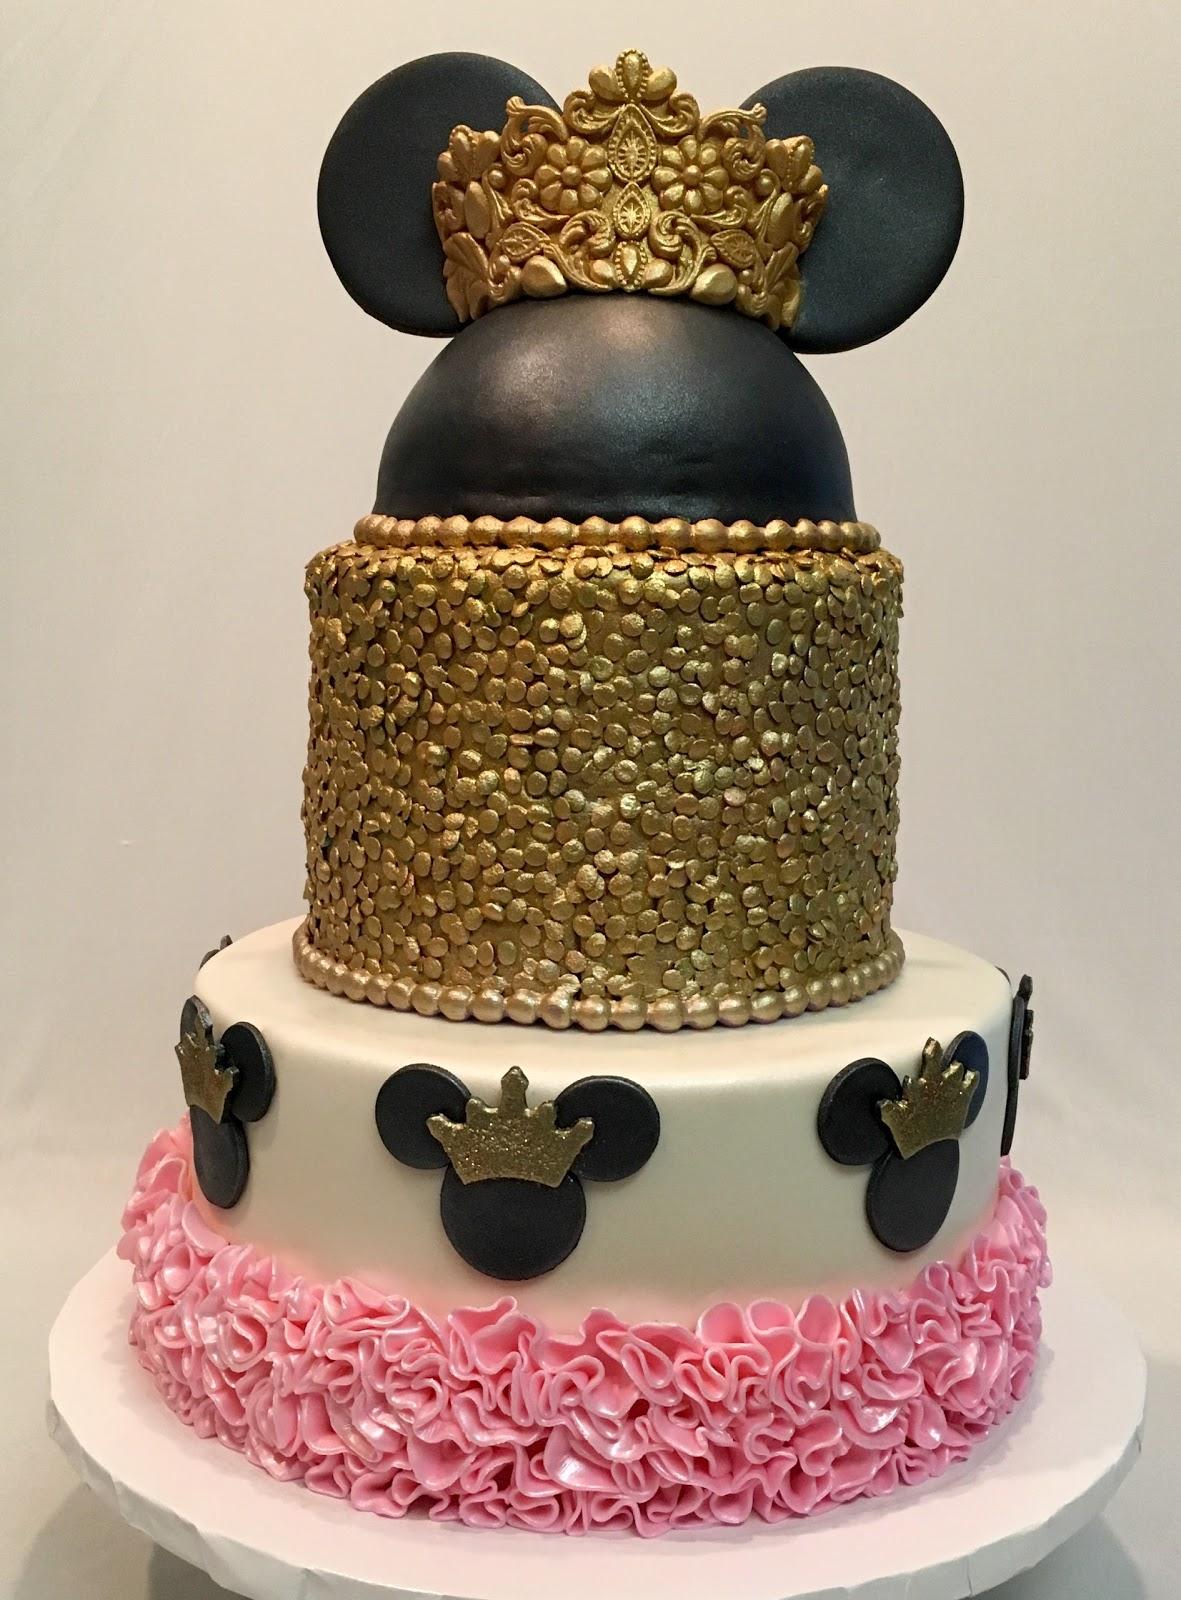 Mymonicakes Princess Minnie Mouse Cake With Tiara Gold